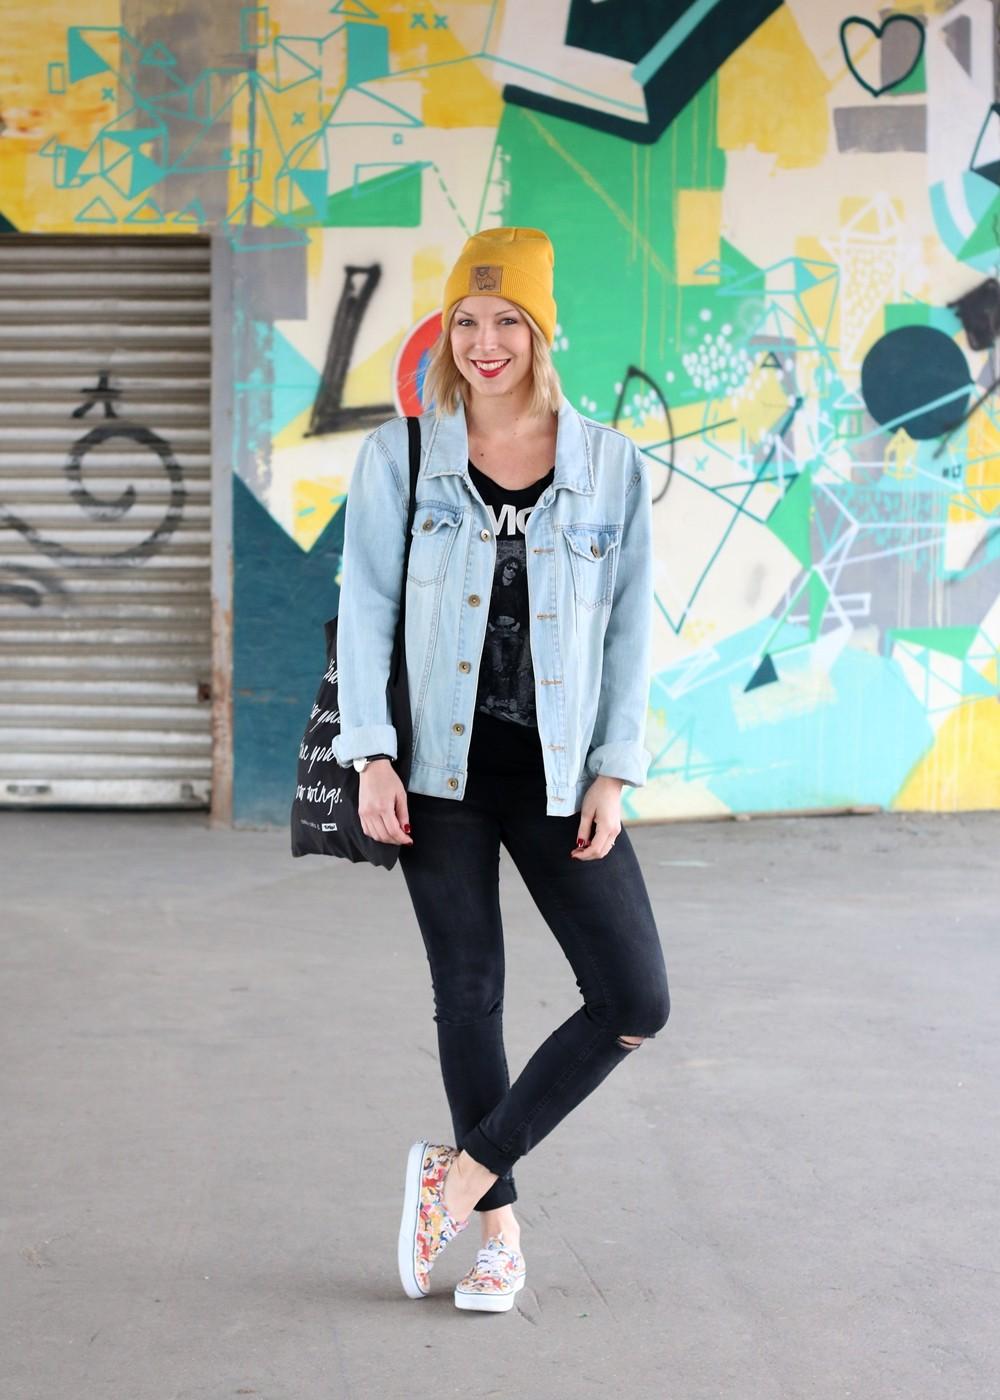 Fahionblogger Outfit Vans Disney Jeansjacke Beanie Fuchs Weebit (2)